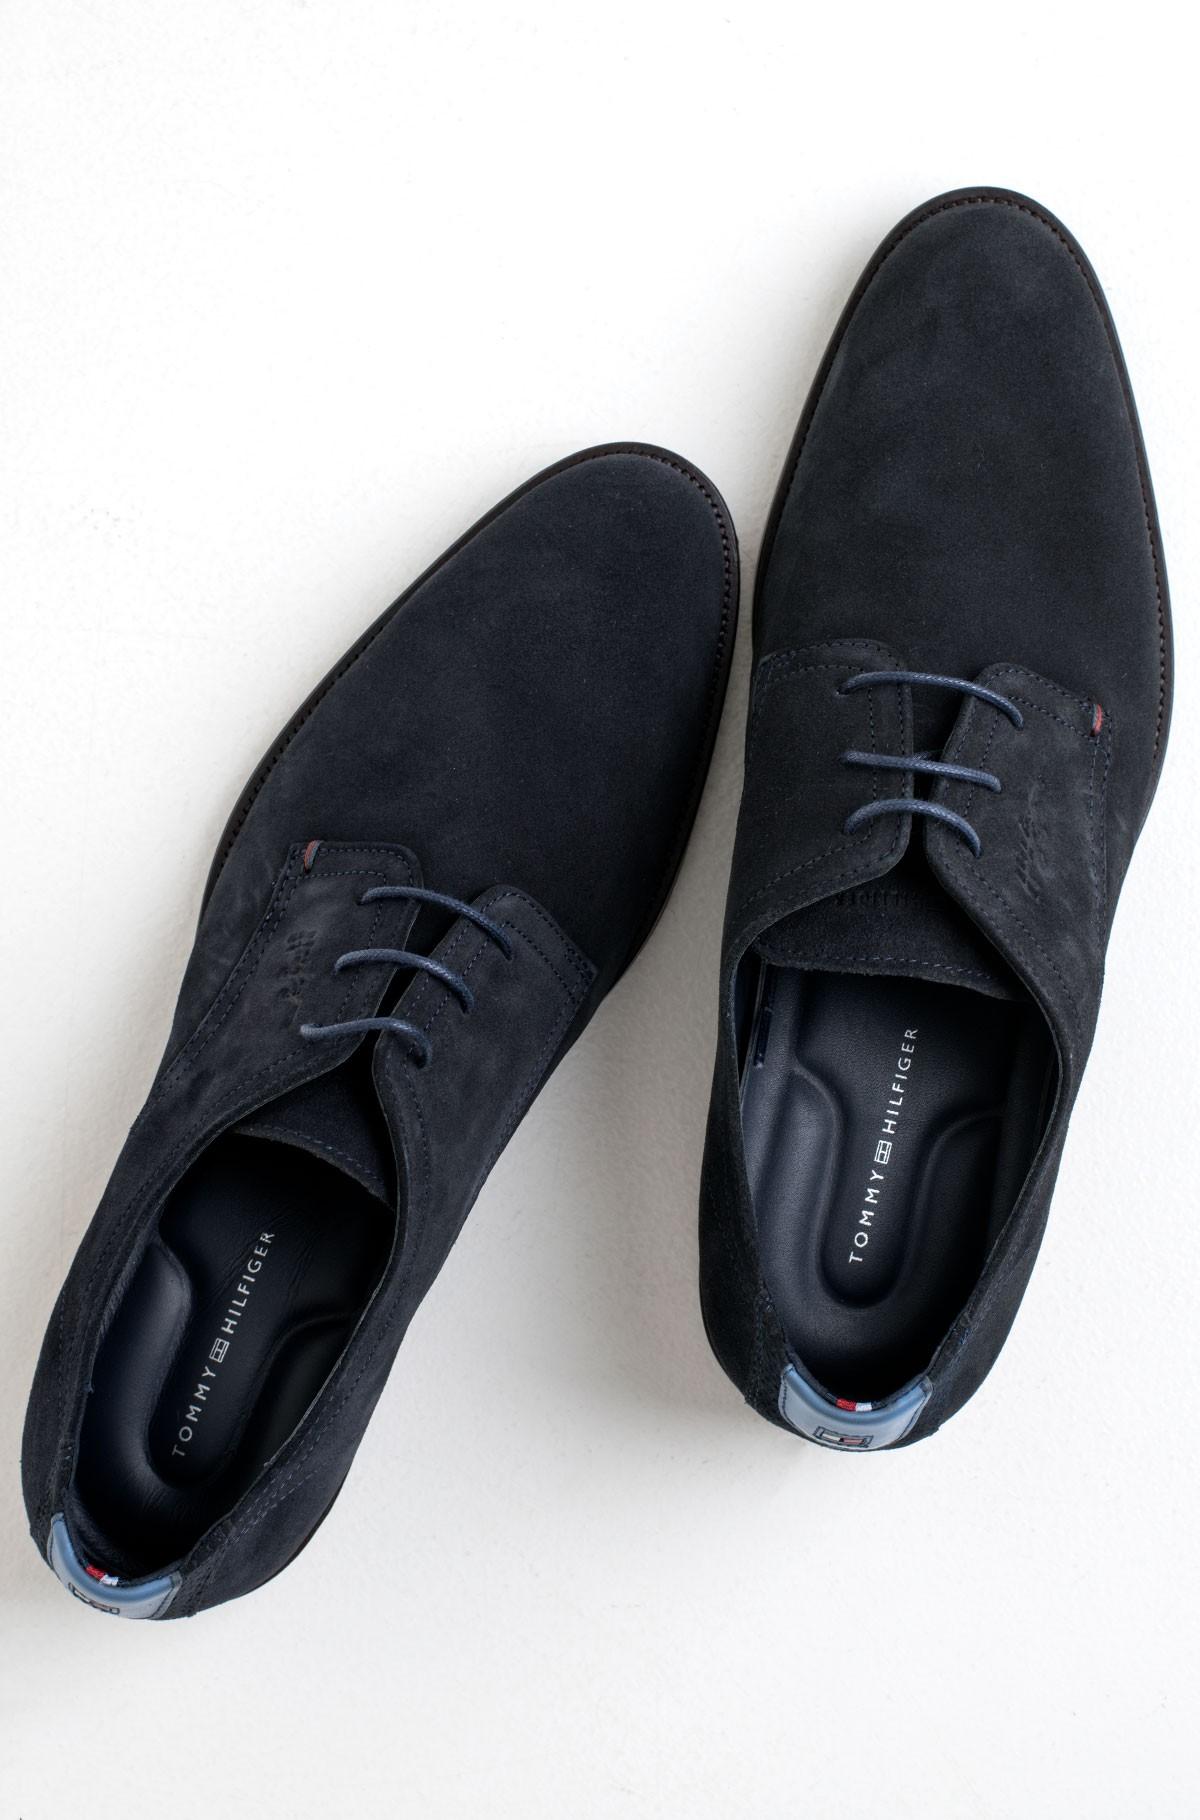 Shoes SIGNATURE HILFIGER SUEDE SHOE-full-3